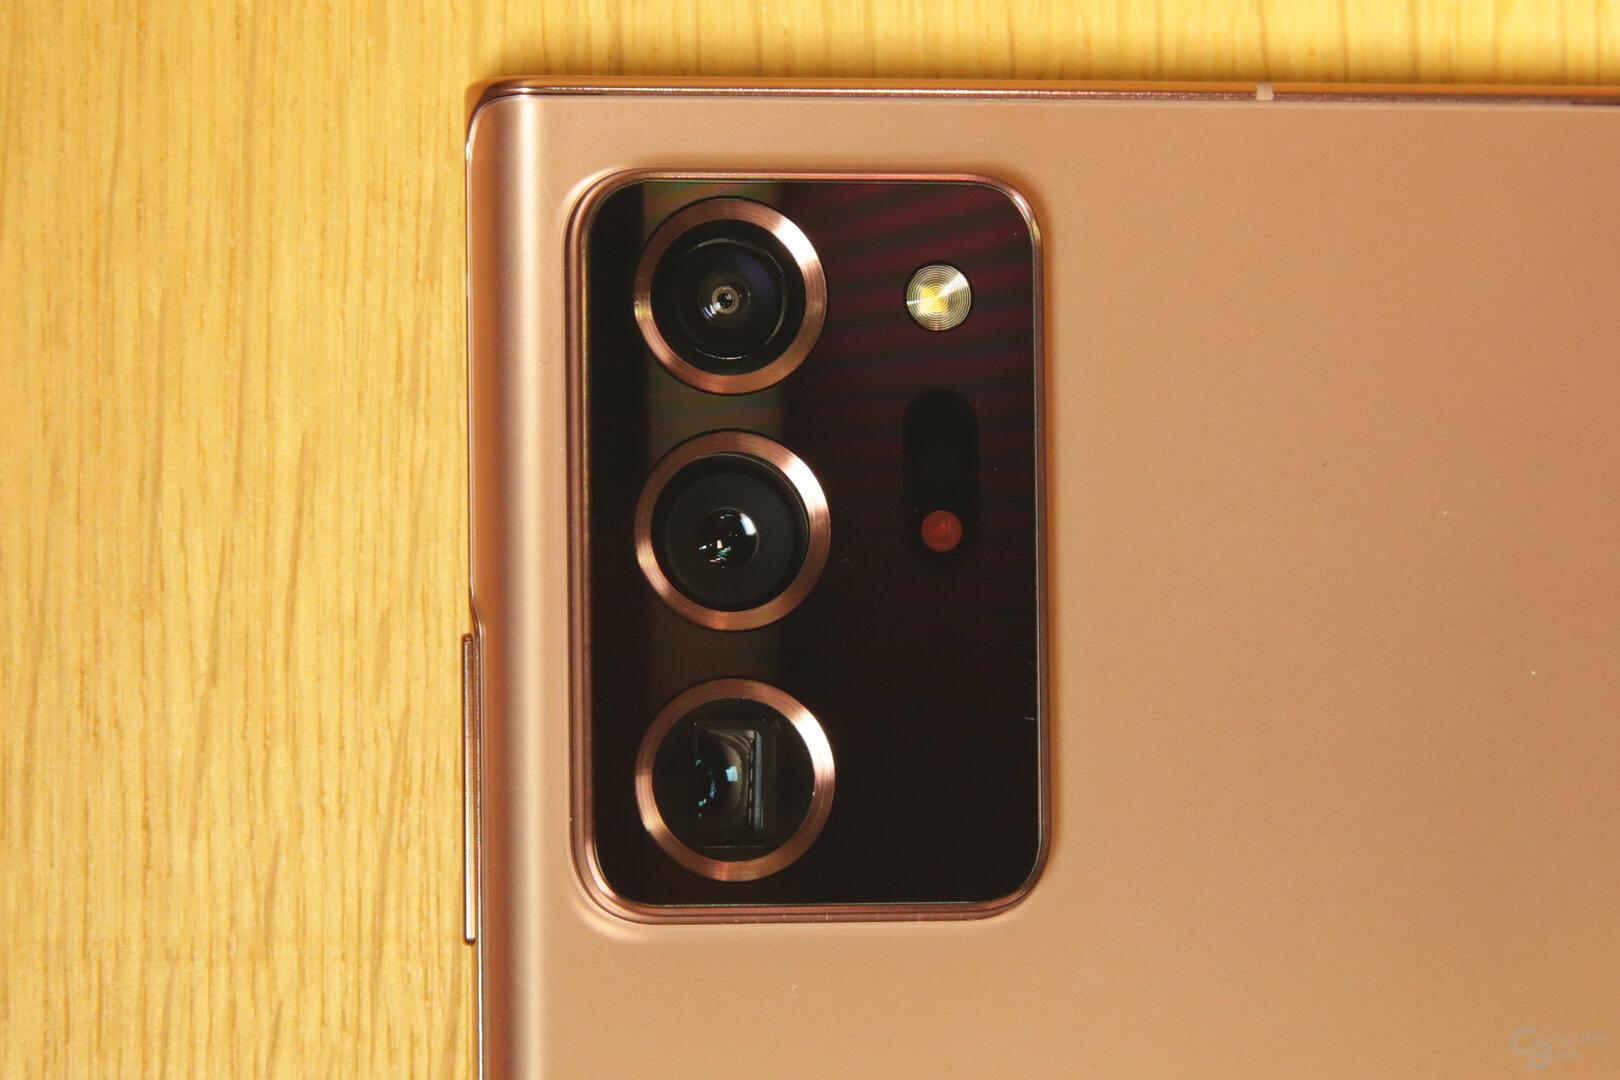 Neue 108-Megapixel-Kamera mit Dual-Pixel-Technologie